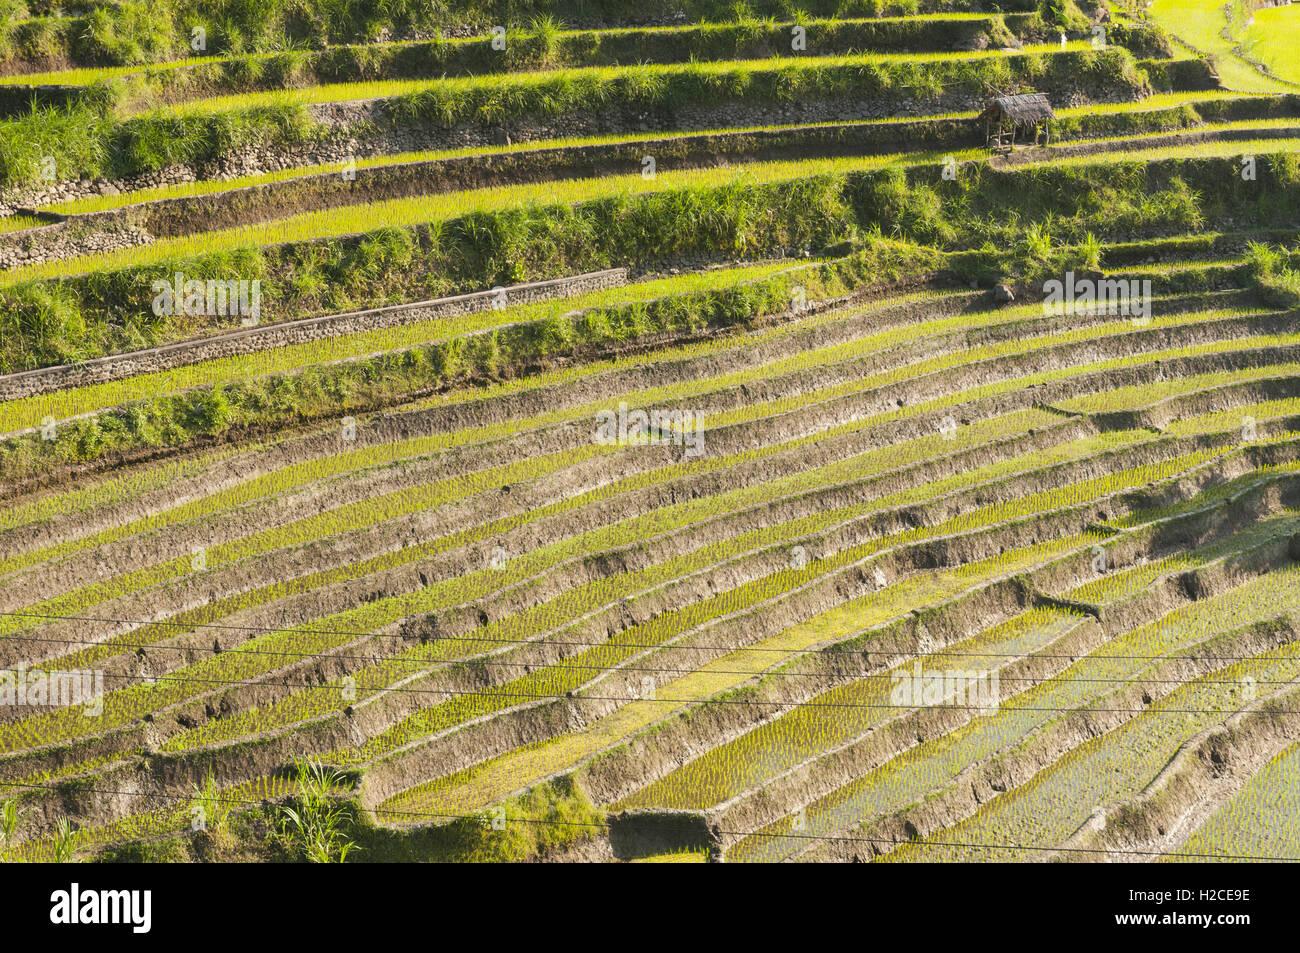 Indonesia, Bali Tirta Ganga, las terrazas de arroz de Bali Imagen De Stock